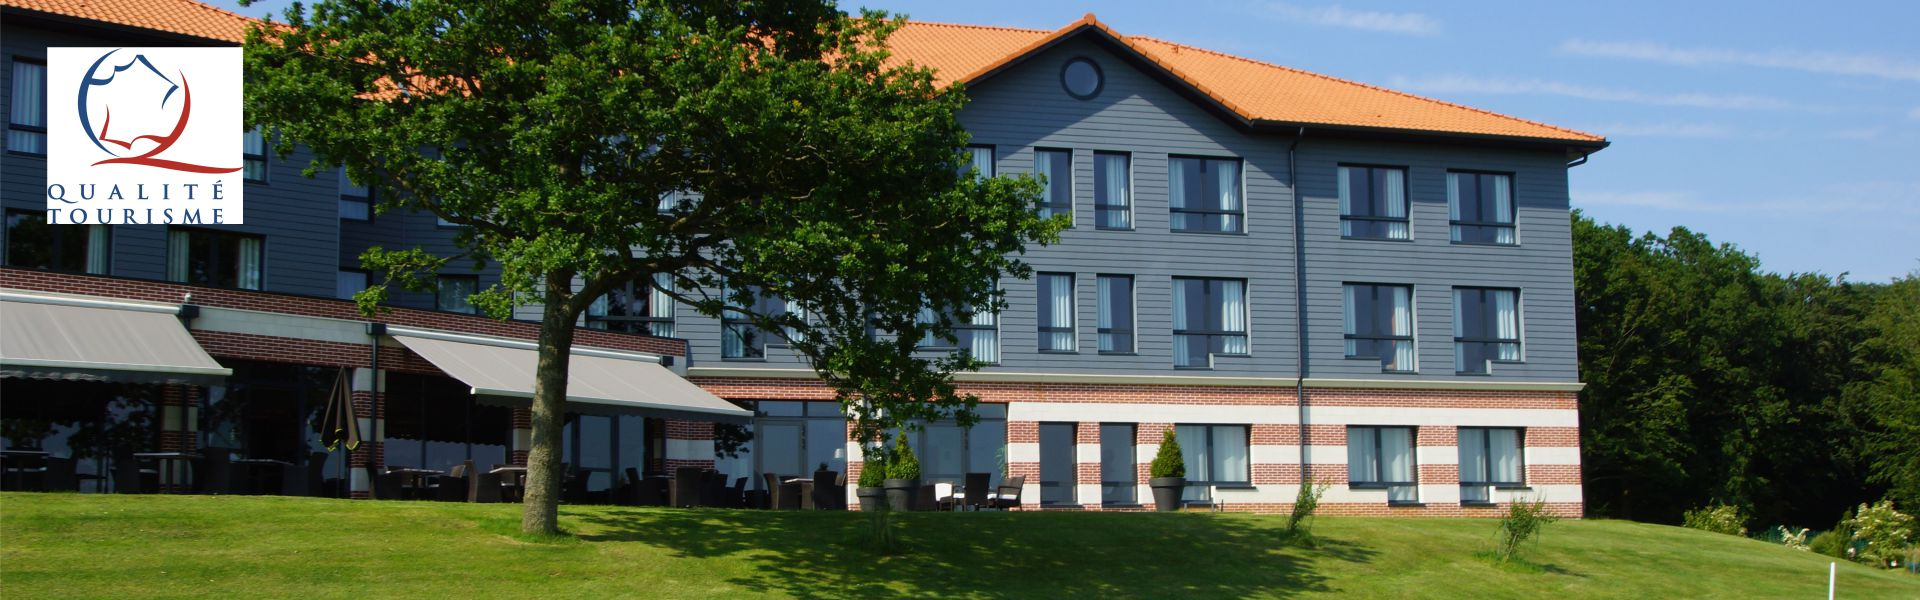 hotel-du-golf